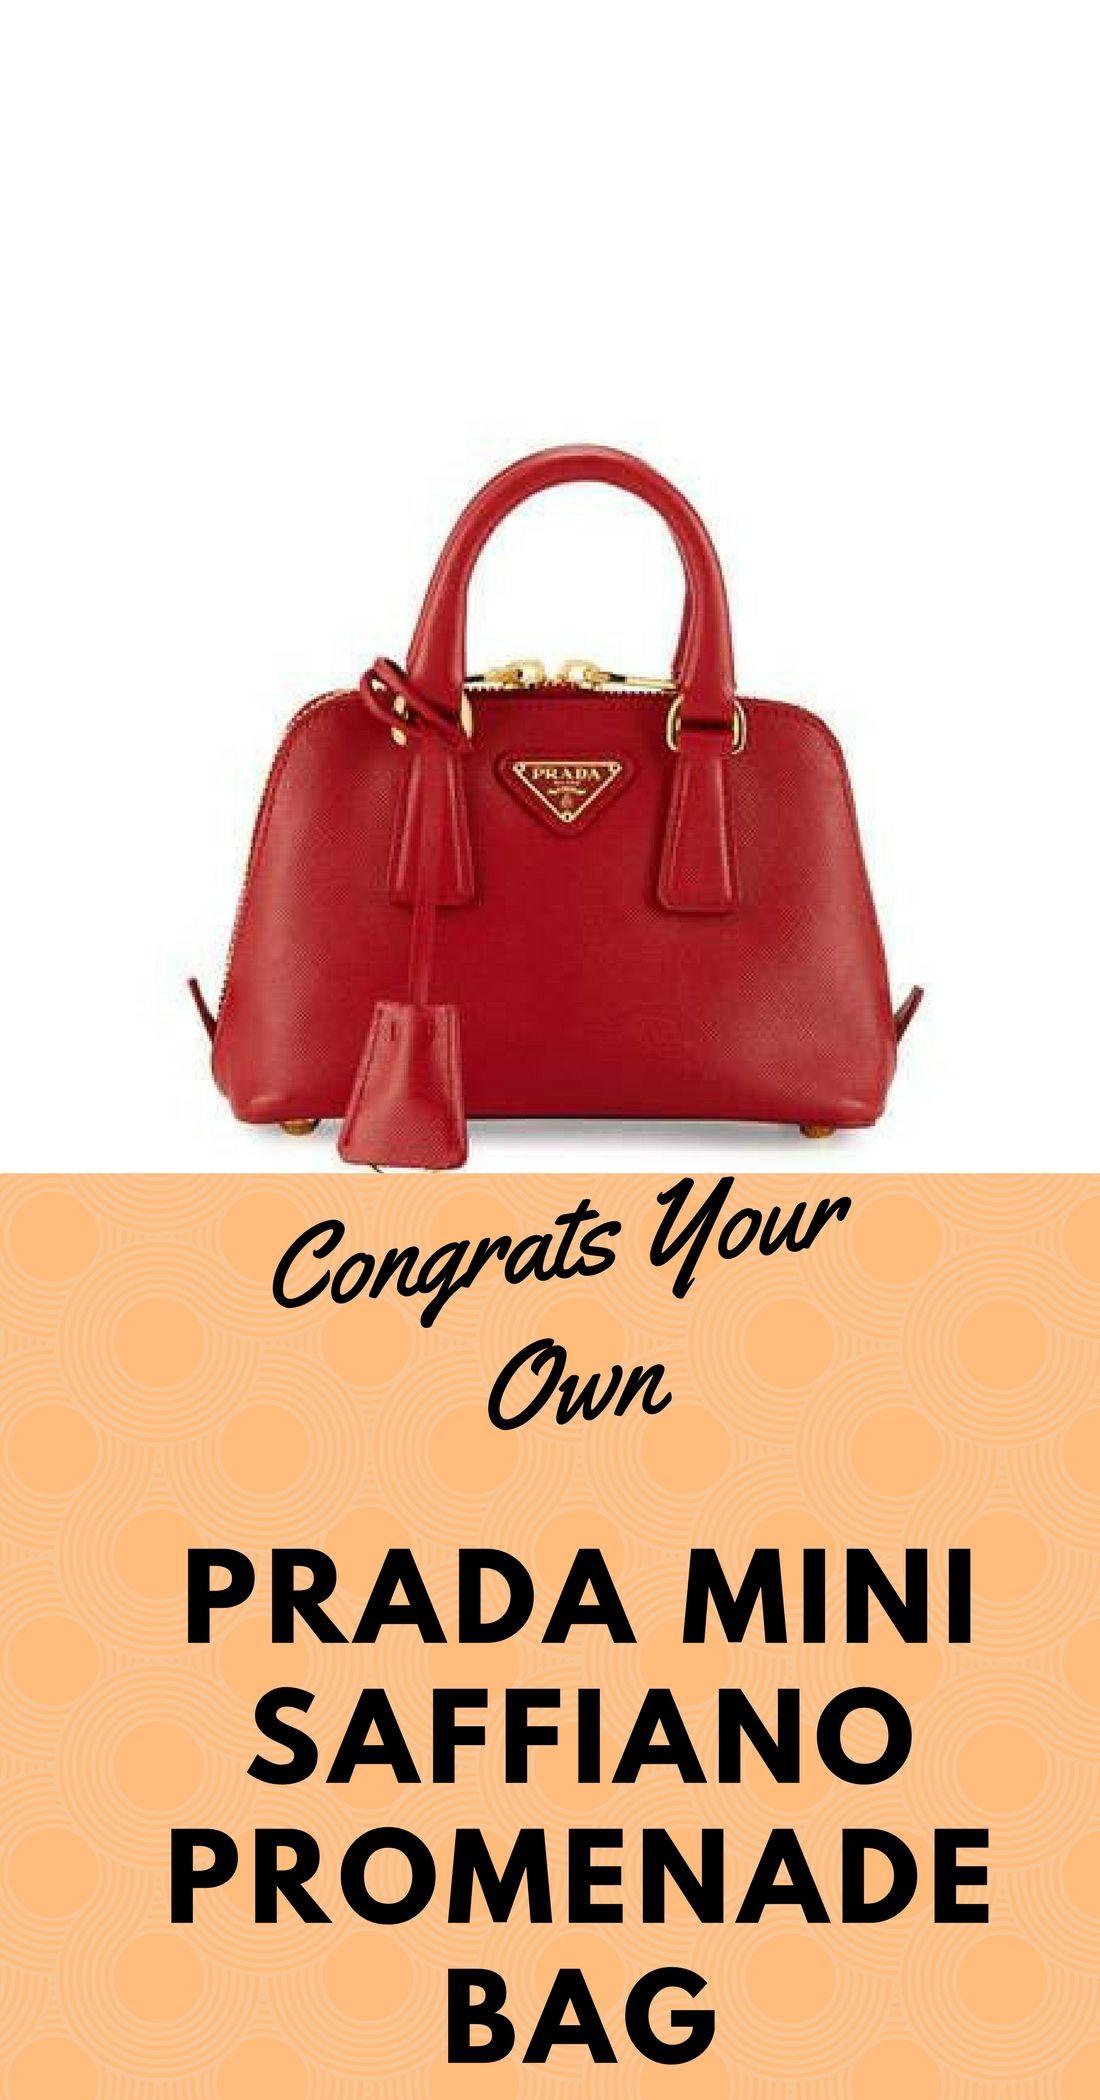 ... new arrivals isnt this prada mini saffiano promenade bag red fuoco a  beauty handbag satchel prada 7bd5c272e8